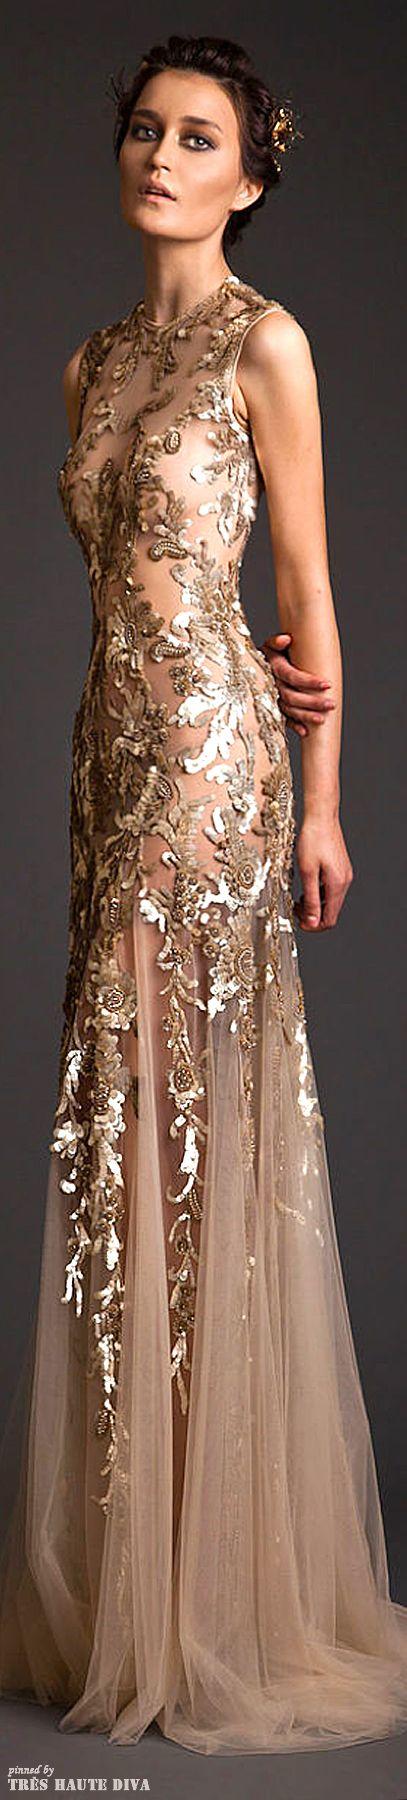 Krikor Jabotian Couture S/S 2014